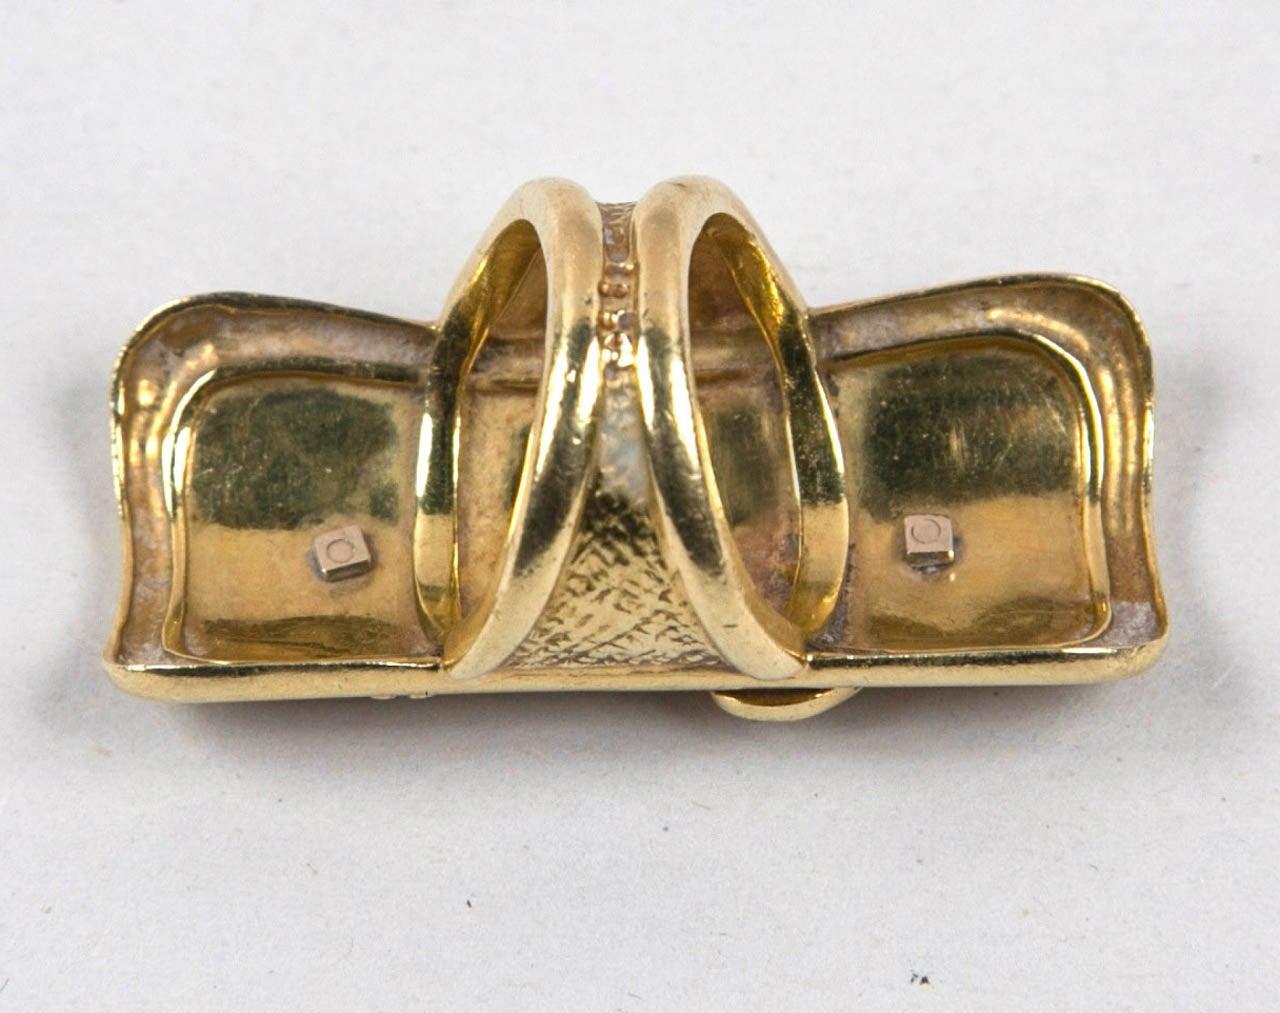 Handmade Gold Ancient Motif Ring Presented by Carol Marks 4